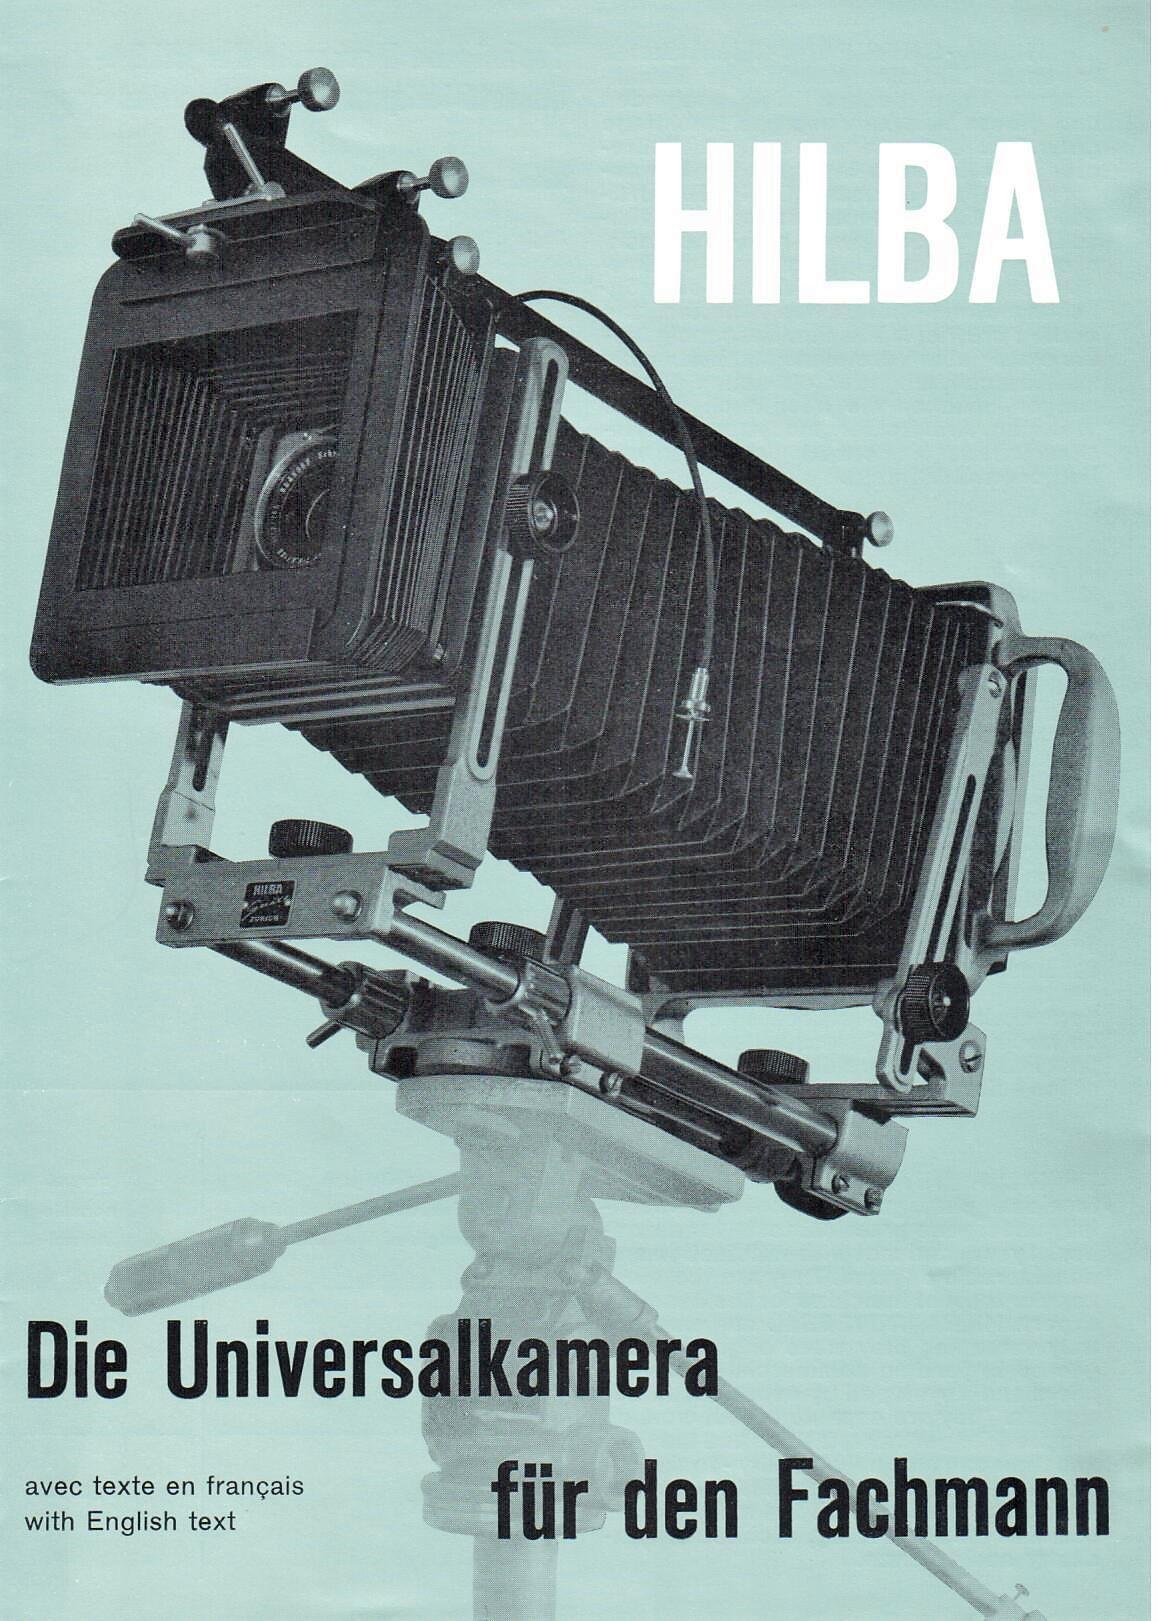 HILBA Universal Camera